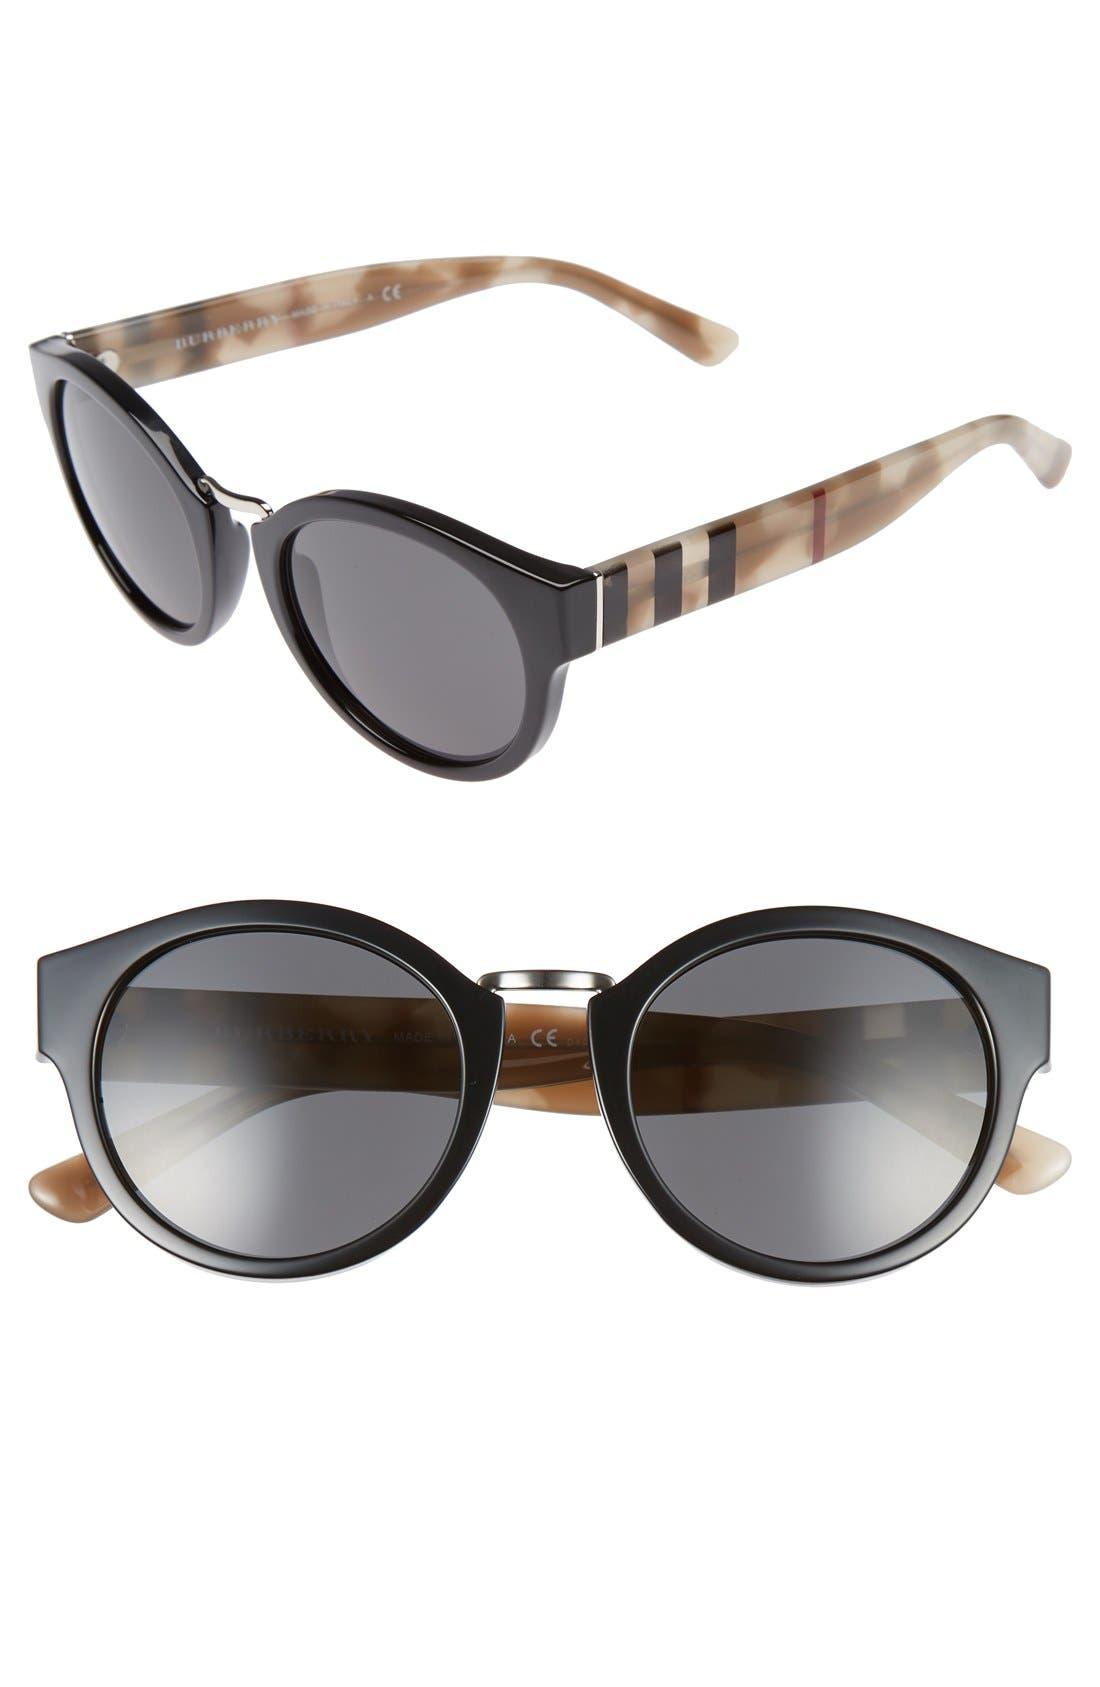 Burberry 50mm Sunglasses